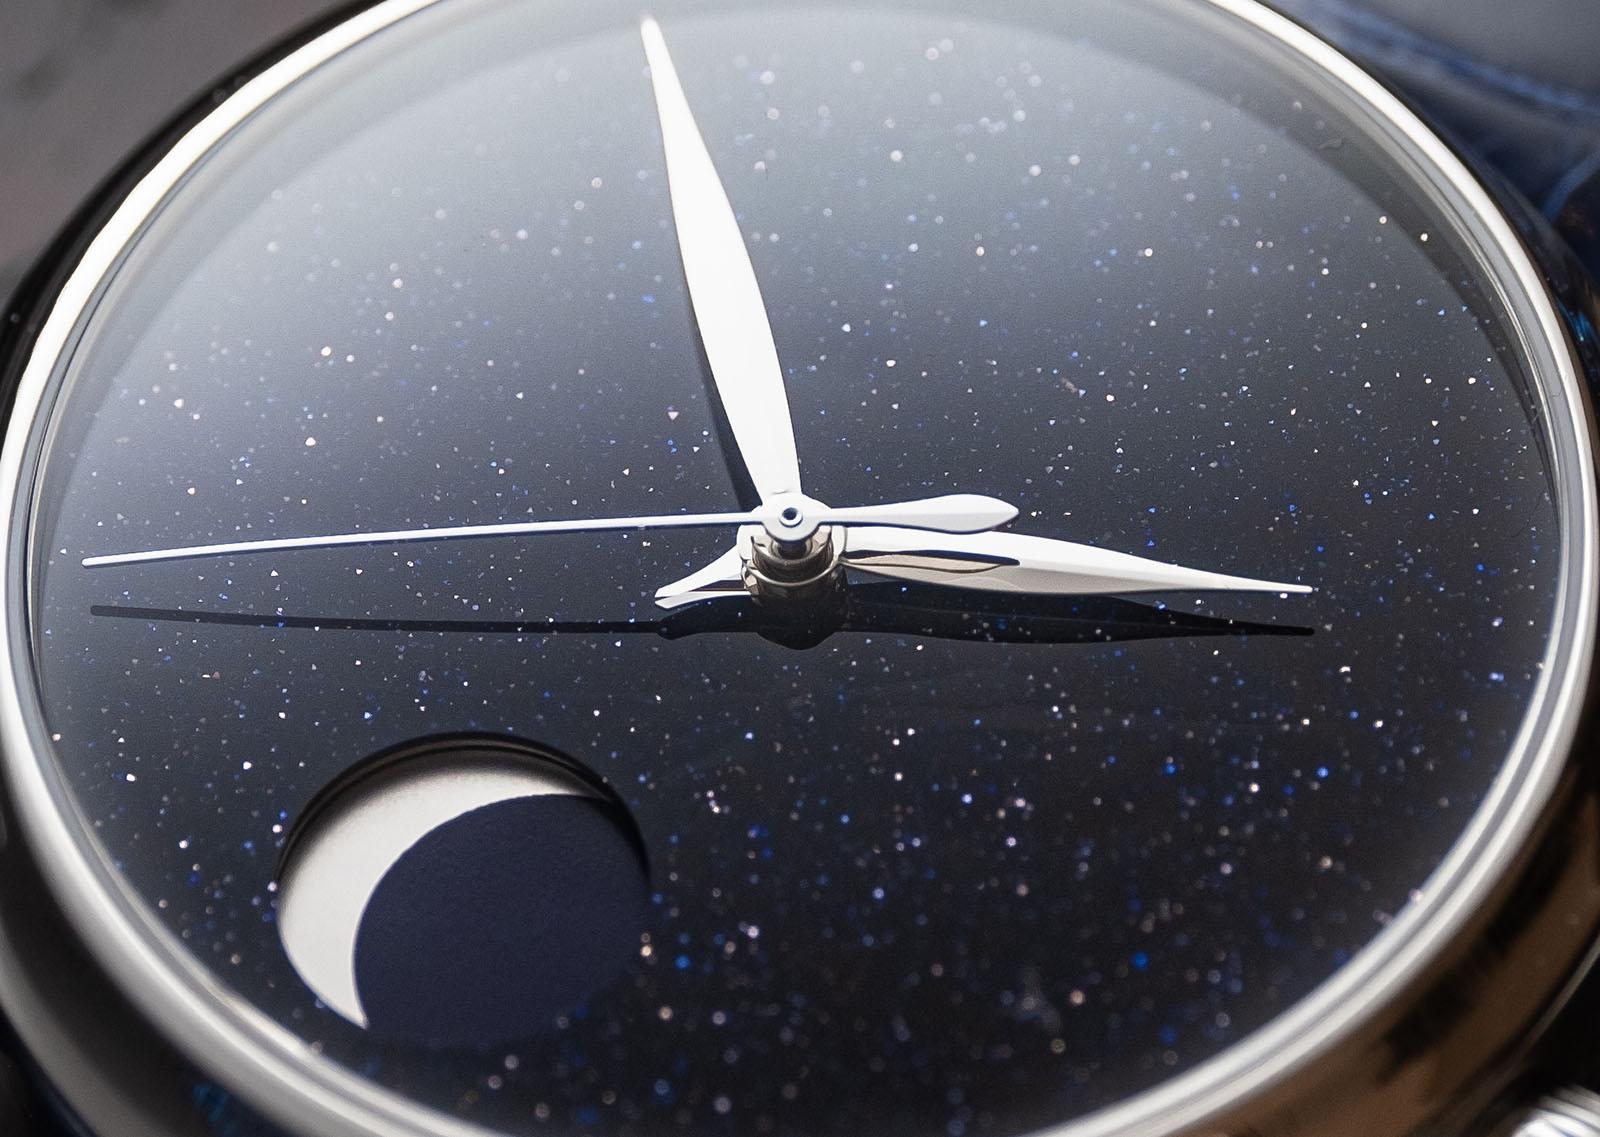 https://watchesbysjx.com/wp-content/uploads/2019/11/H.-Moser-Cie.-Endeavour-Perpetual-Moon-Concept-Aventurine-6.jpg